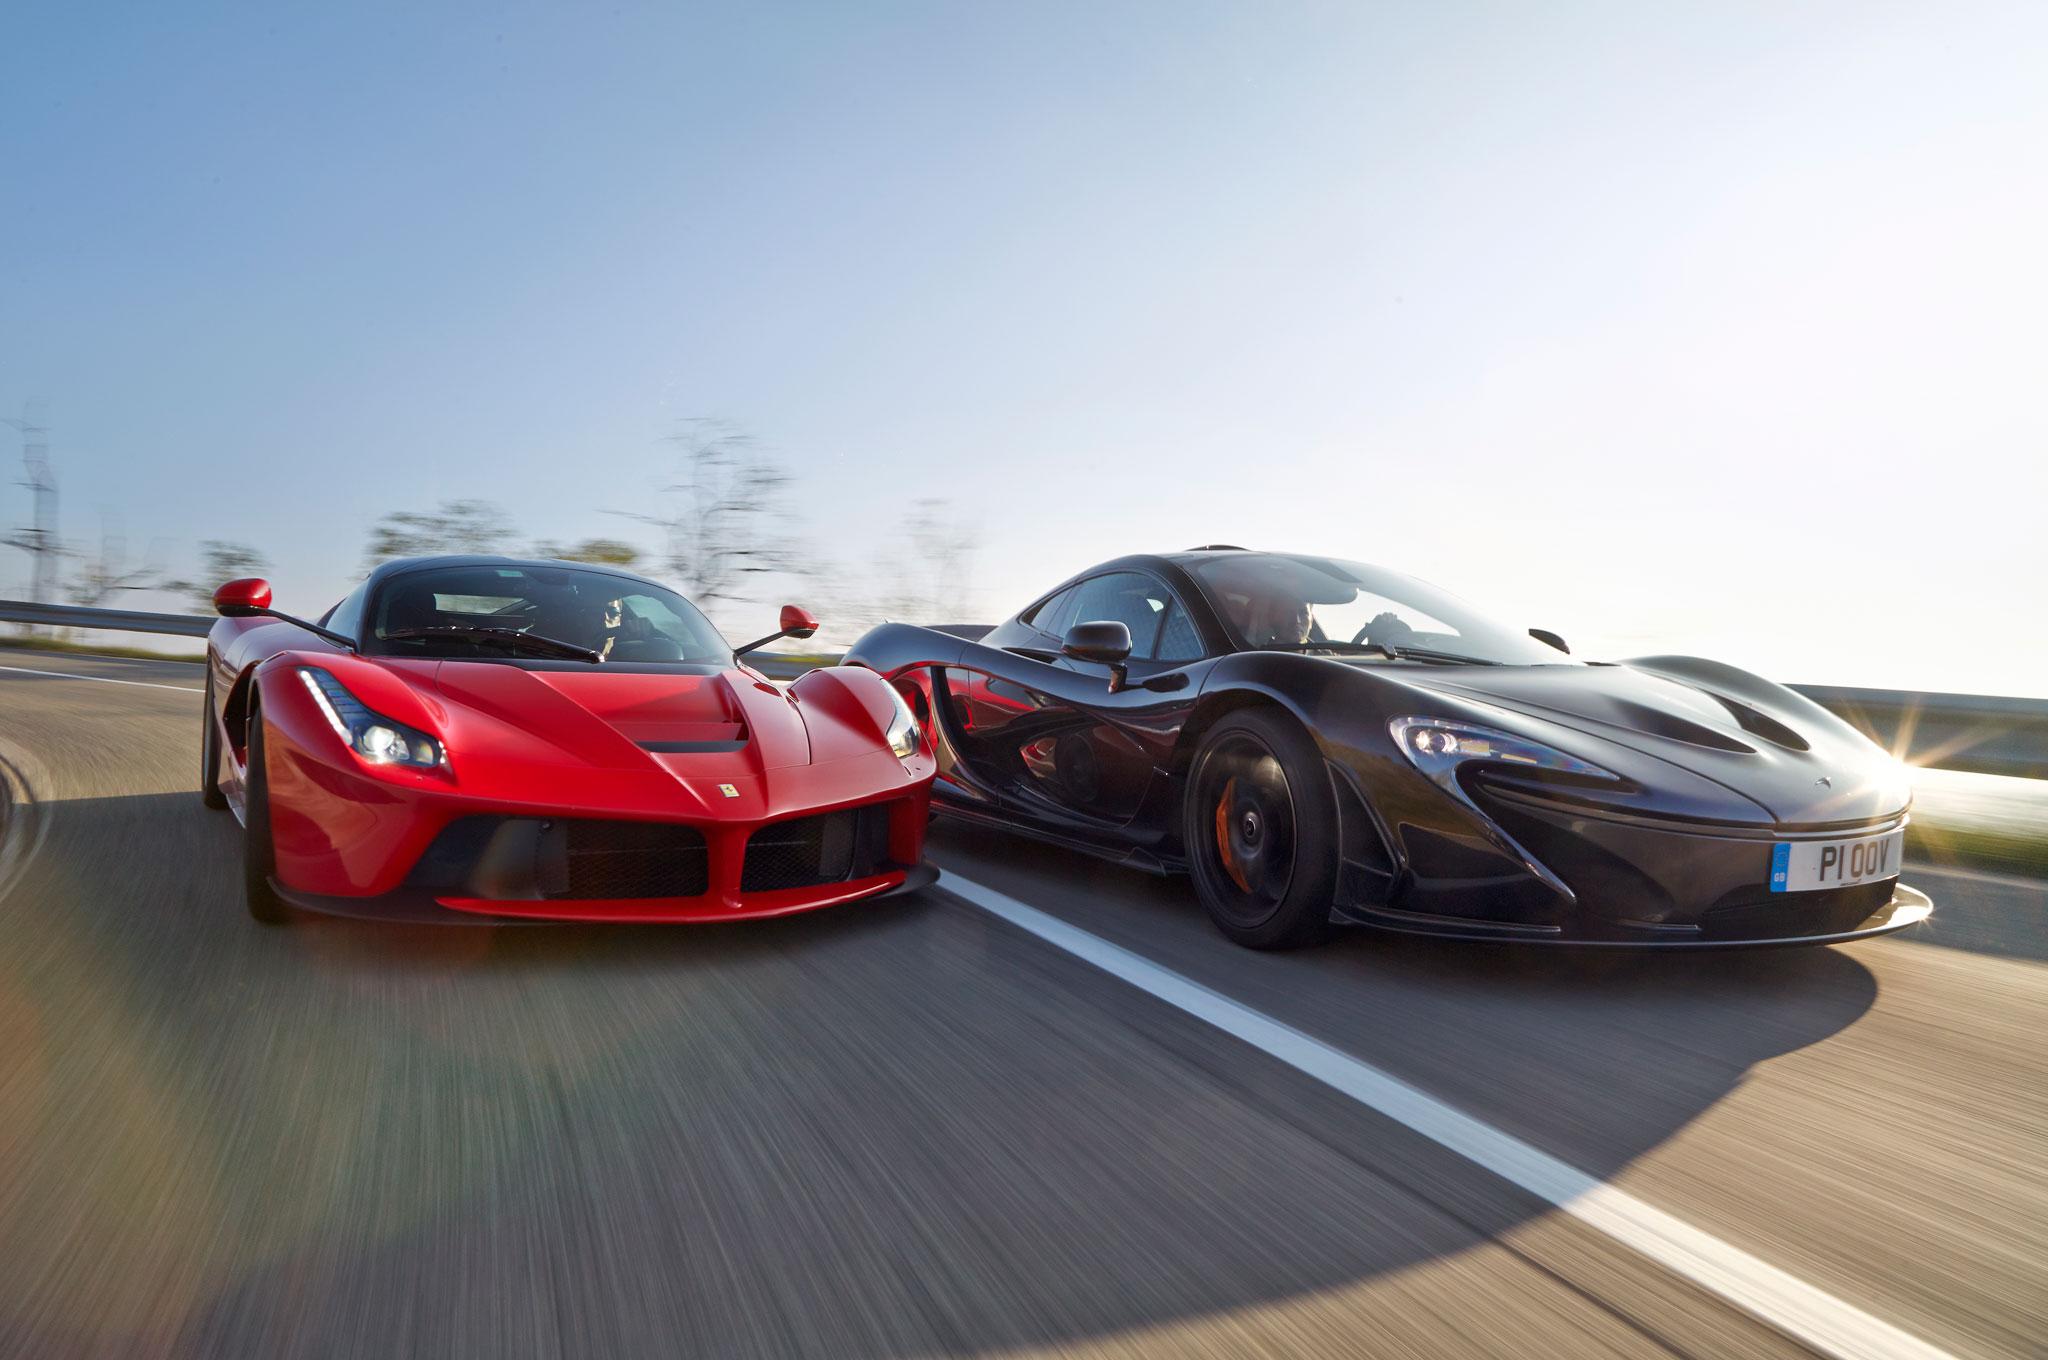 Hybrid is the New Fast: Ferrari LaFerrari vs. McLaren P1